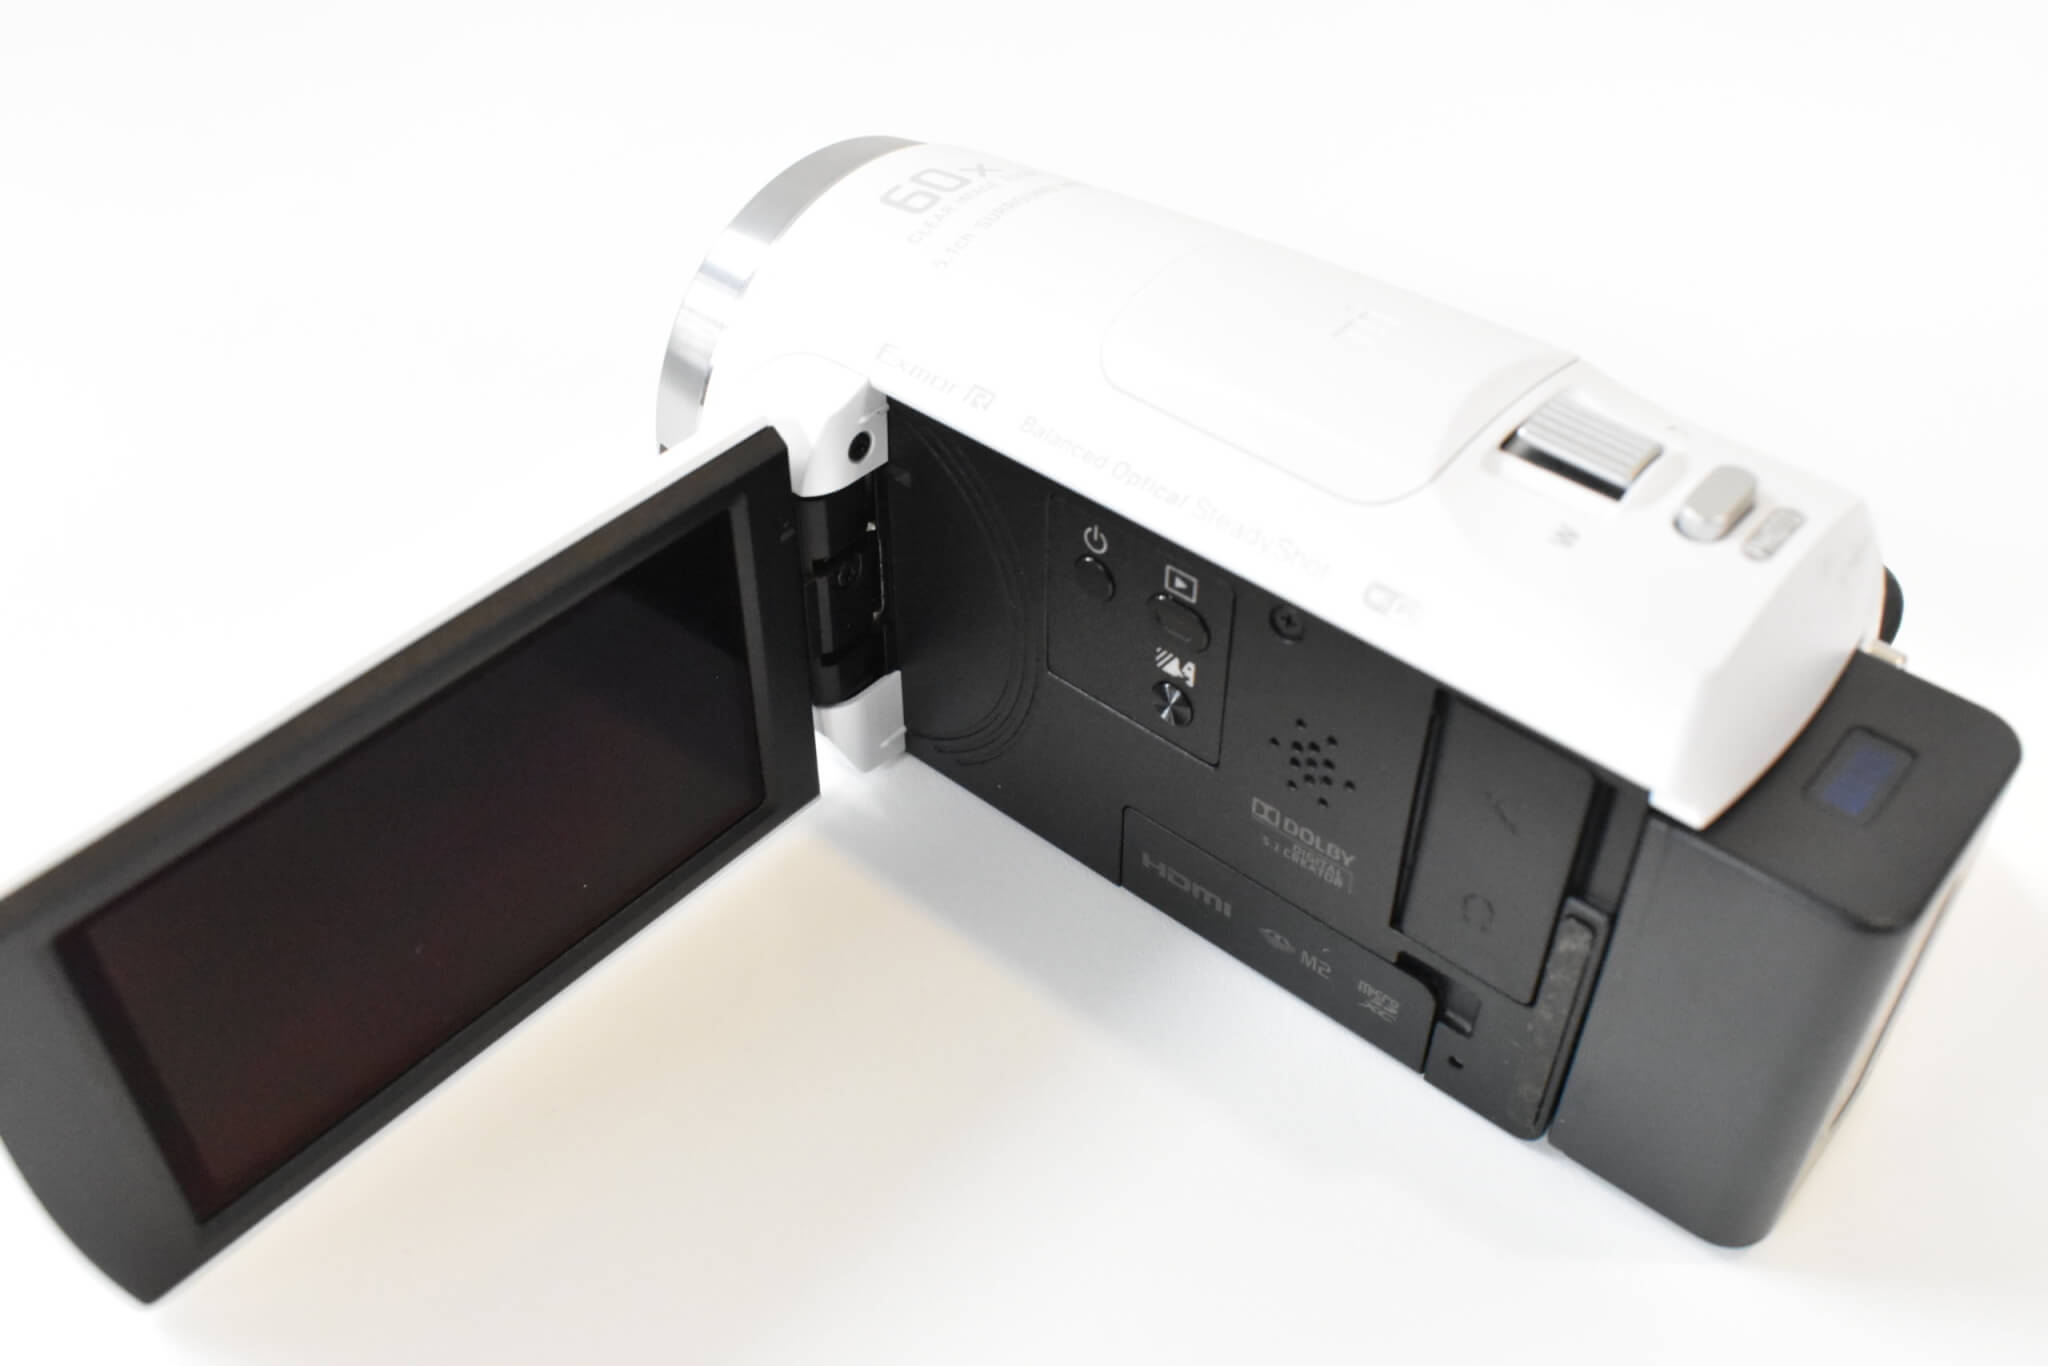 SONYハンディカム 最新全7機種を写真付きで紹介 HDR-CX680